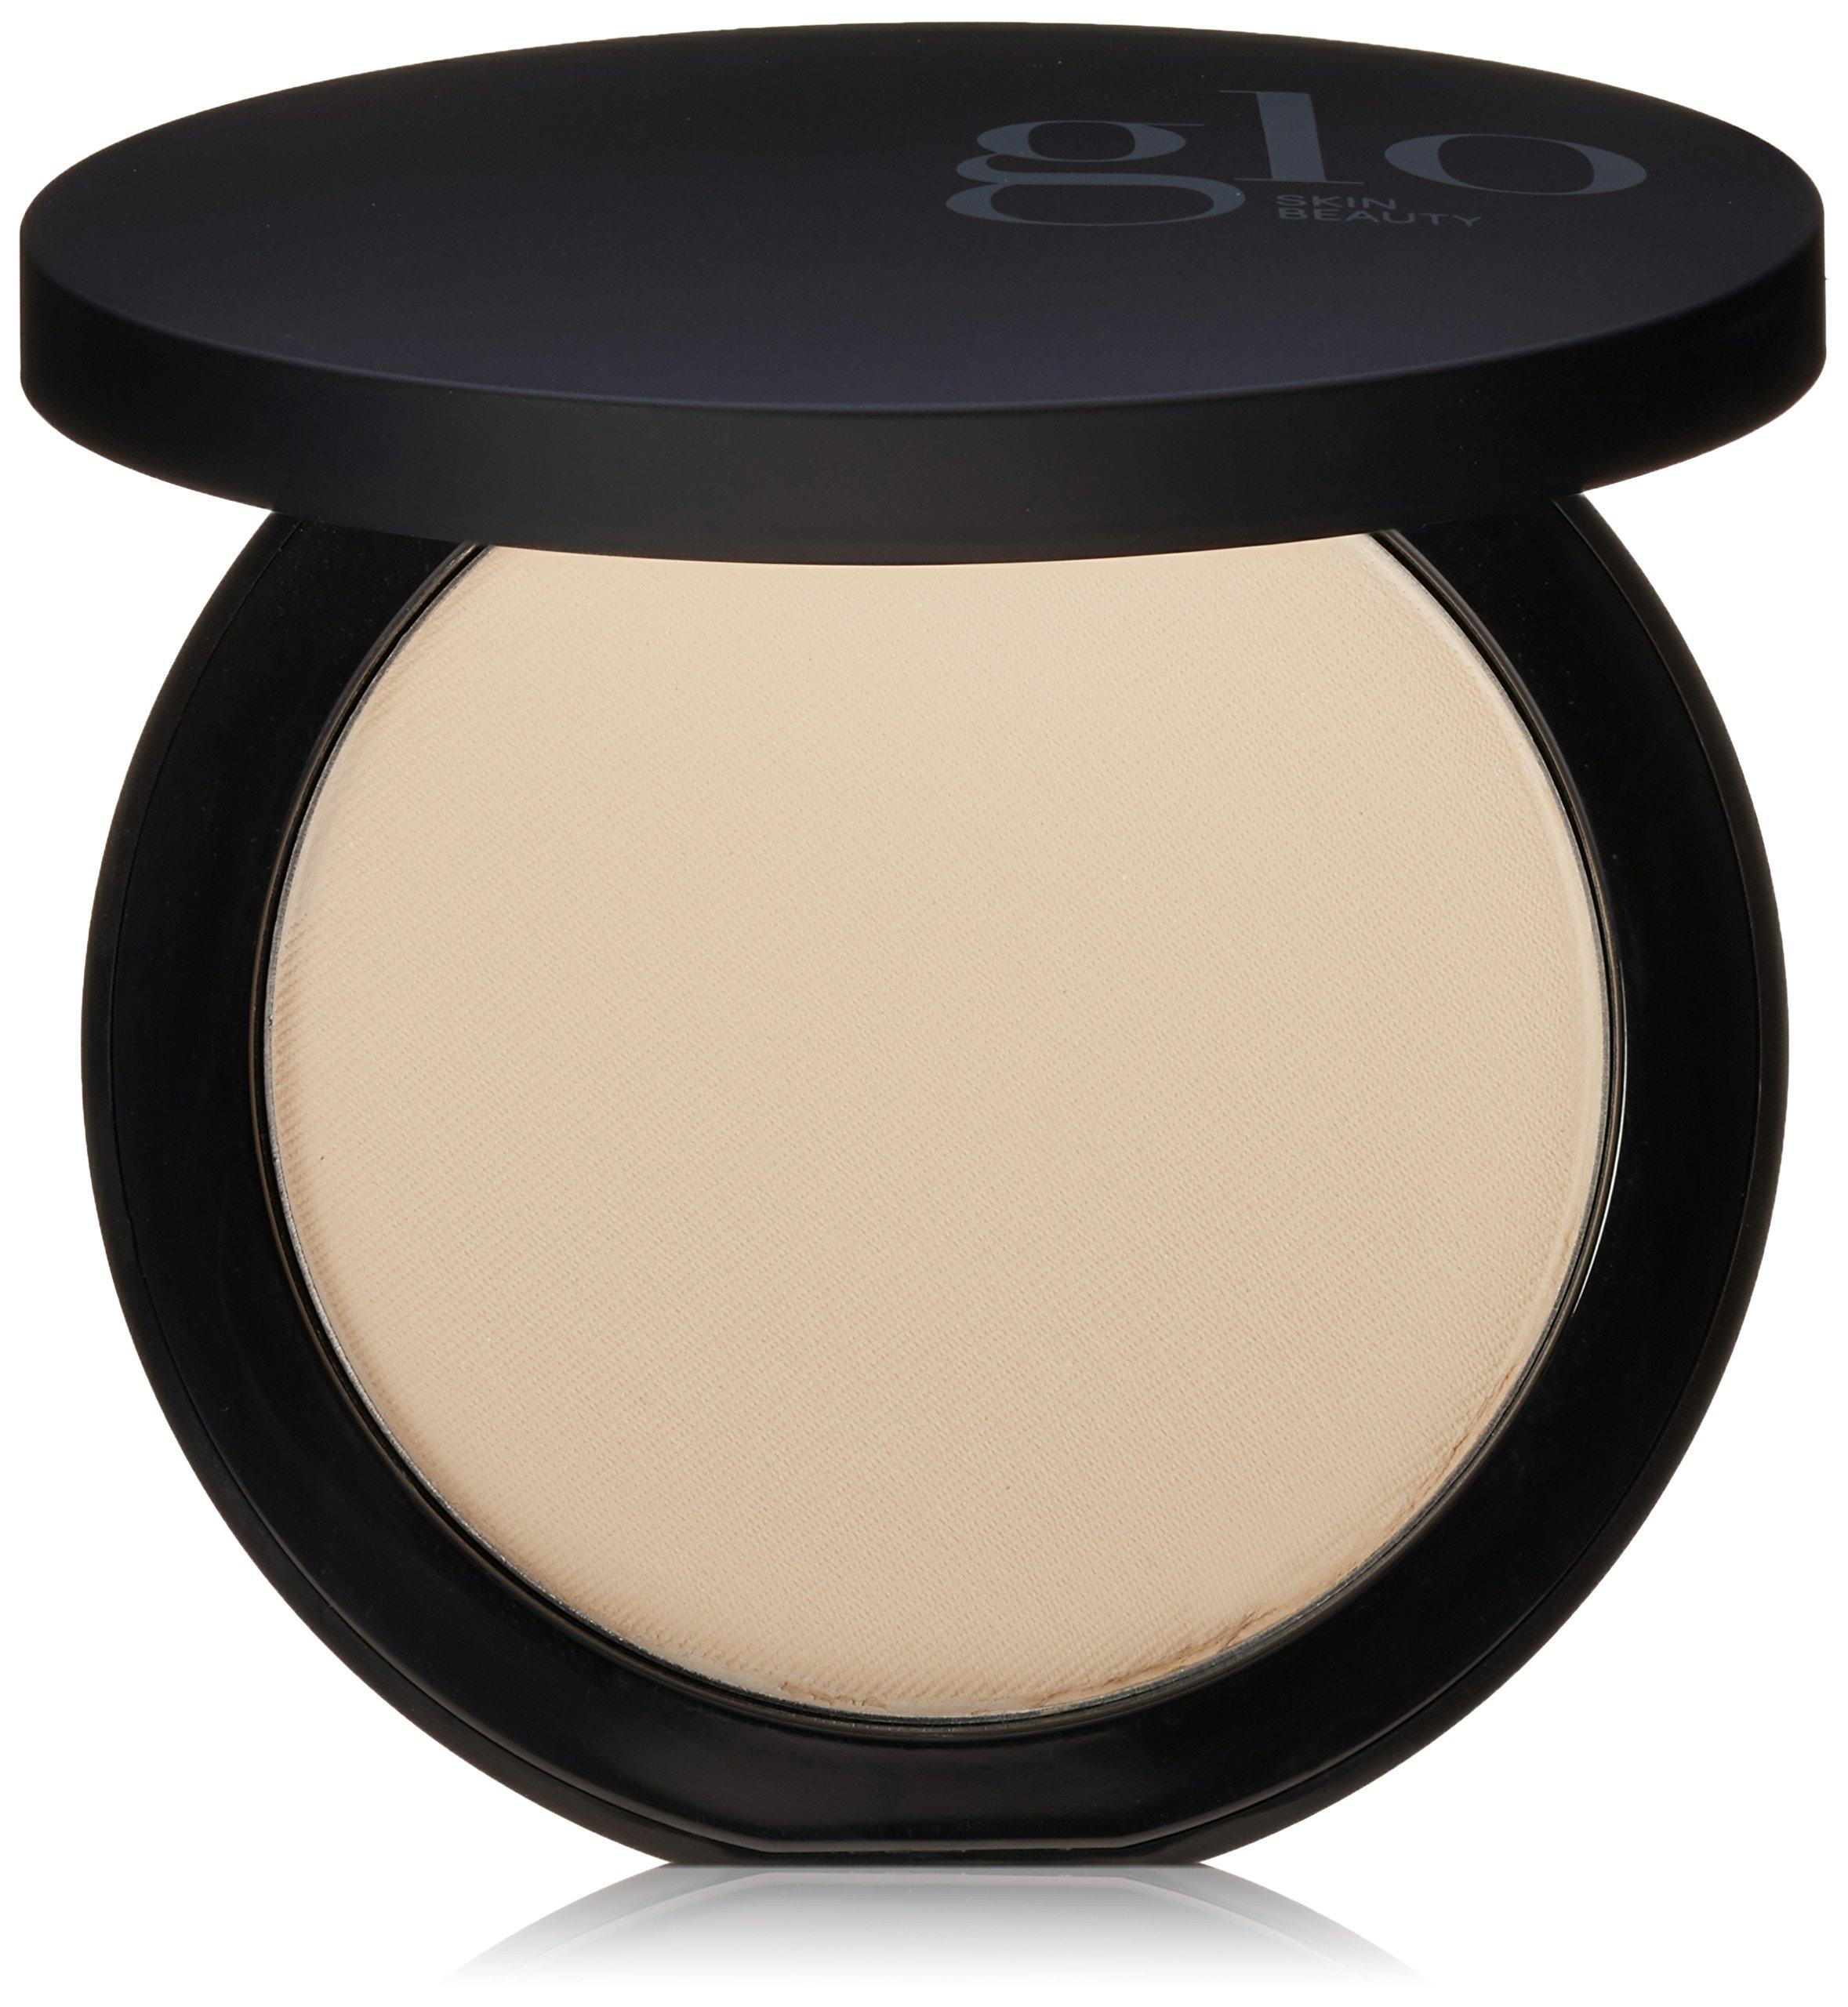 Glo Skin Beauty Perfecting Powder | Translucent Foundation Makeup Setting Powder | Set Liquid and Powder Foundations